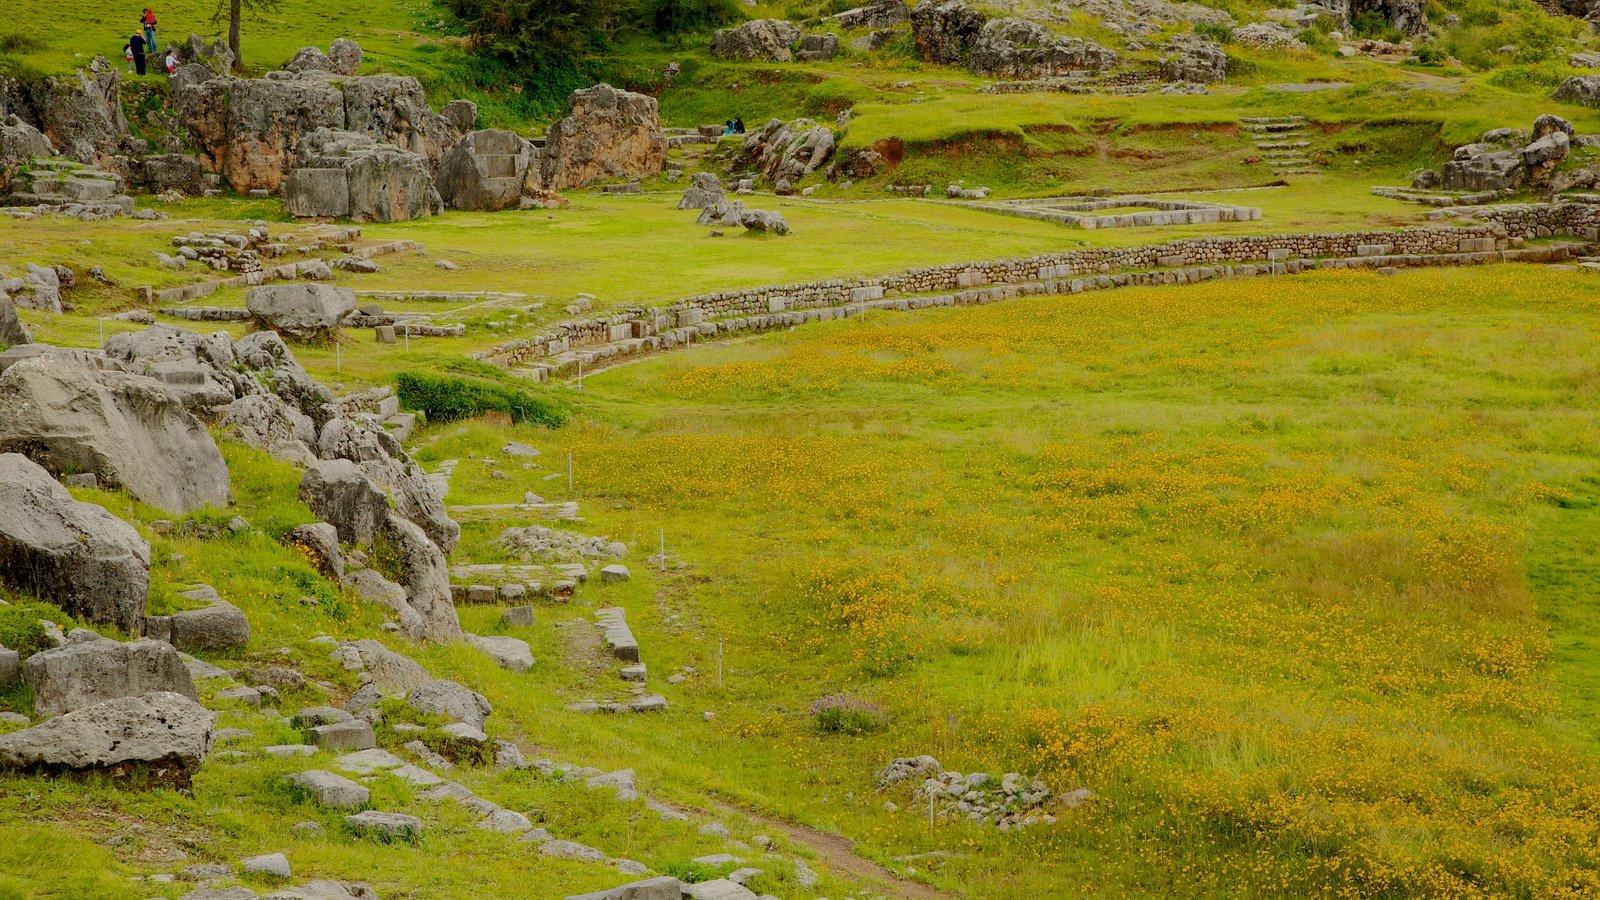 Sacsayhuaman caracterizando paisagem e elementos de patrimônio